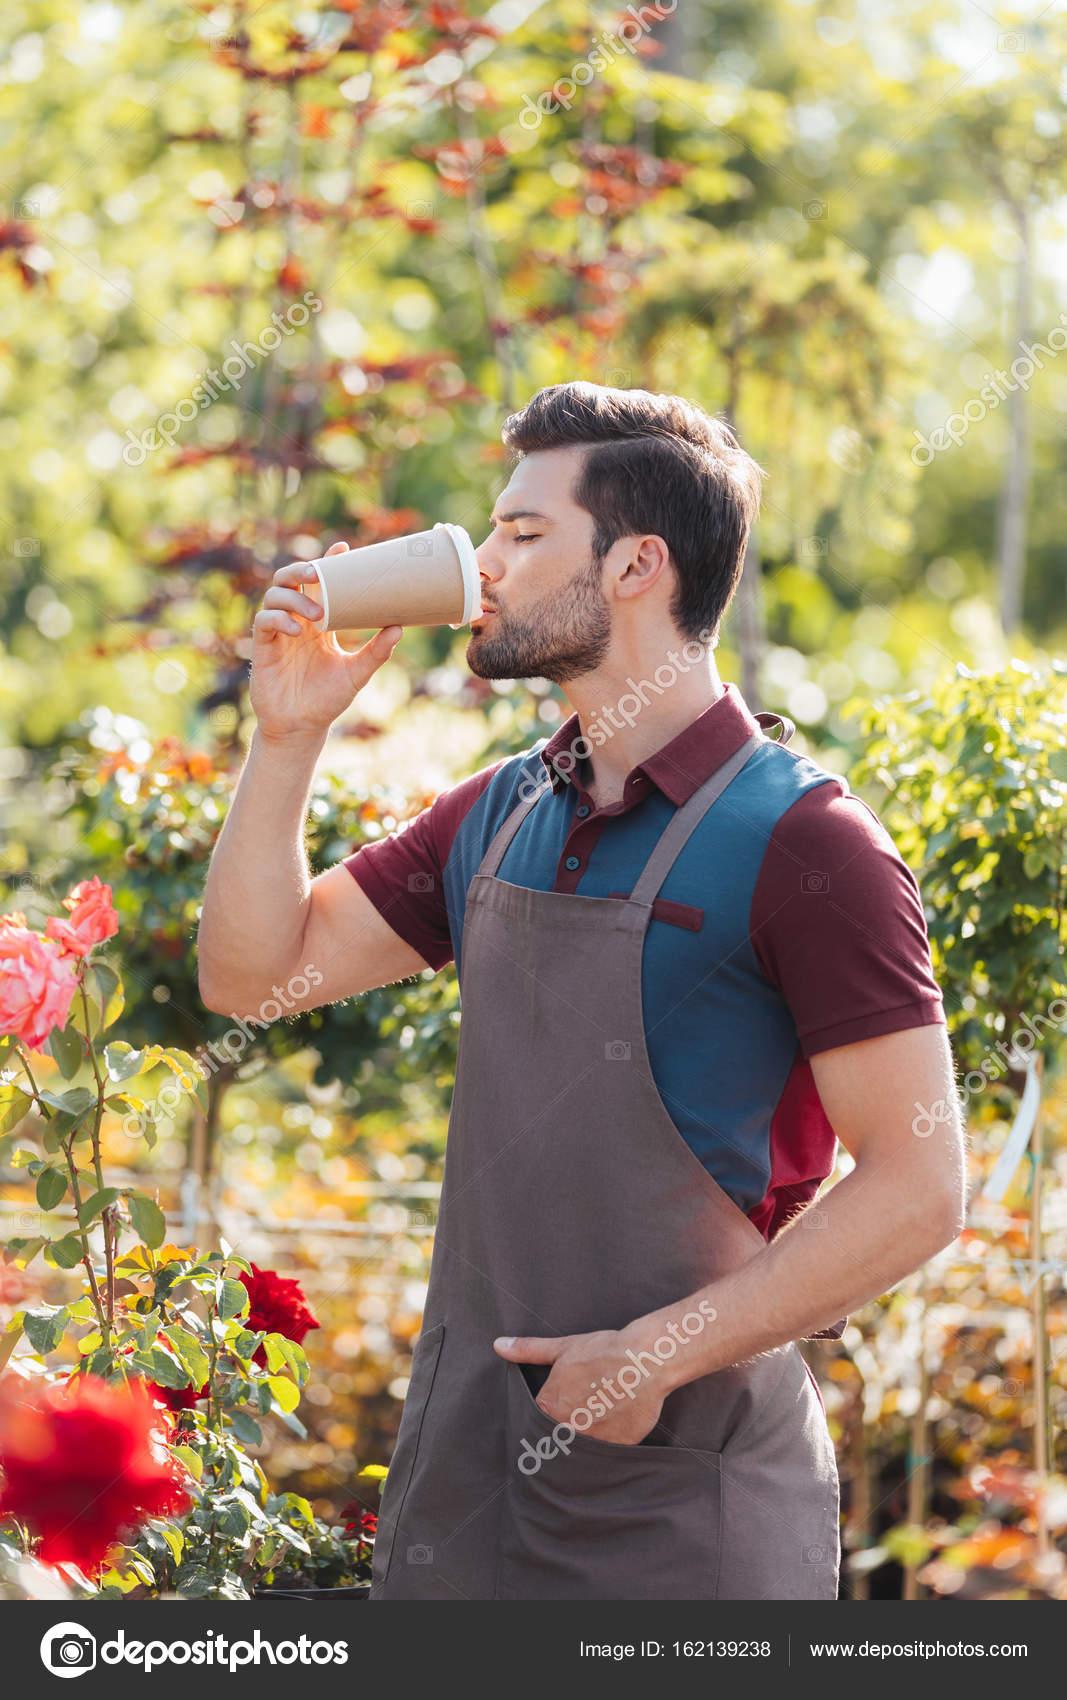 MI BLOC, QUE NO BLOG - Página 26 Depositphotos_162139238-stock-photo-gardener-drinking-coffee-in-garden